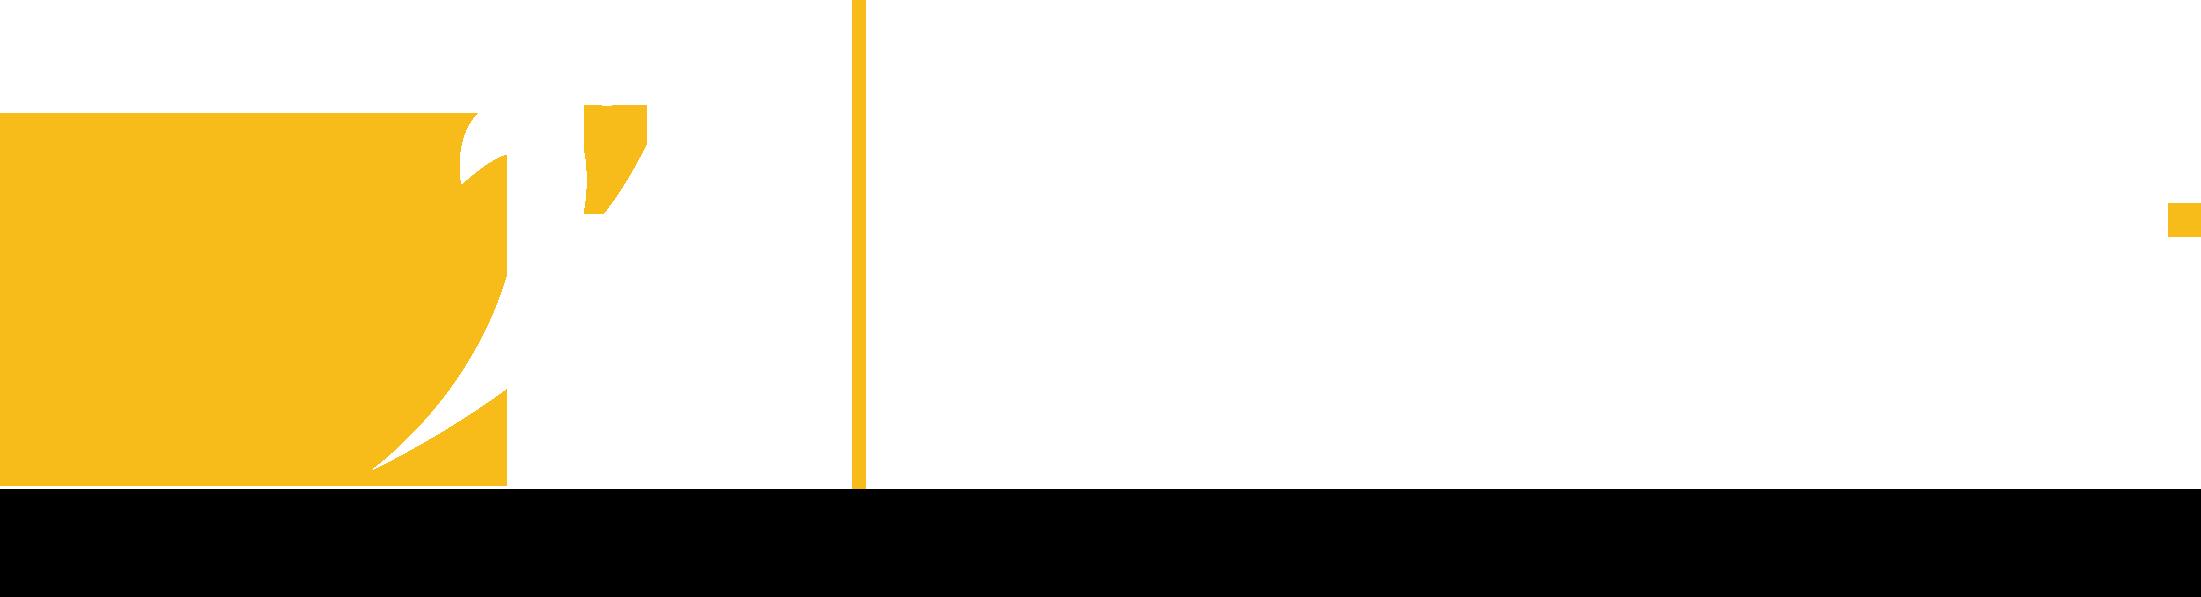 https://campaign-image.eu/zohocampaigns/71975000000266032_zc_v33_1615749999280_fokus_msp_logo_weiß_gelb.png